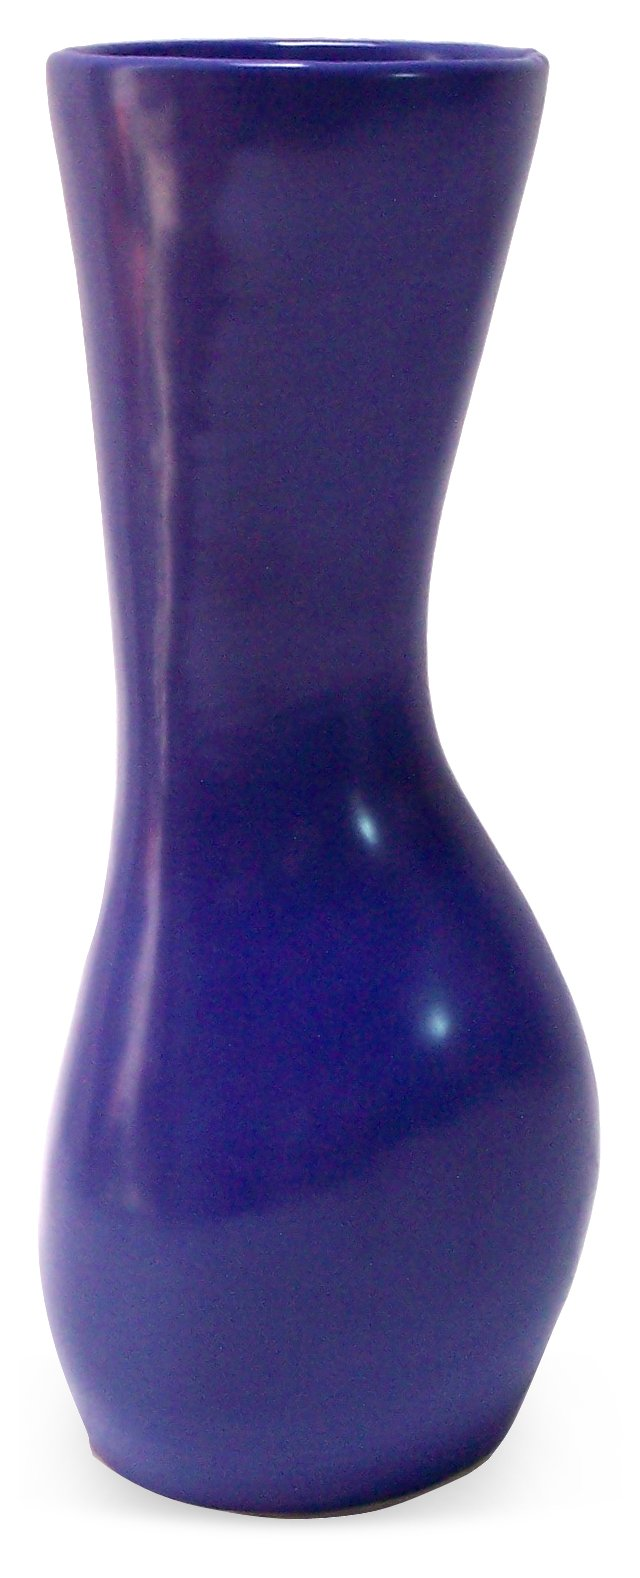 Tall Curvy Vase